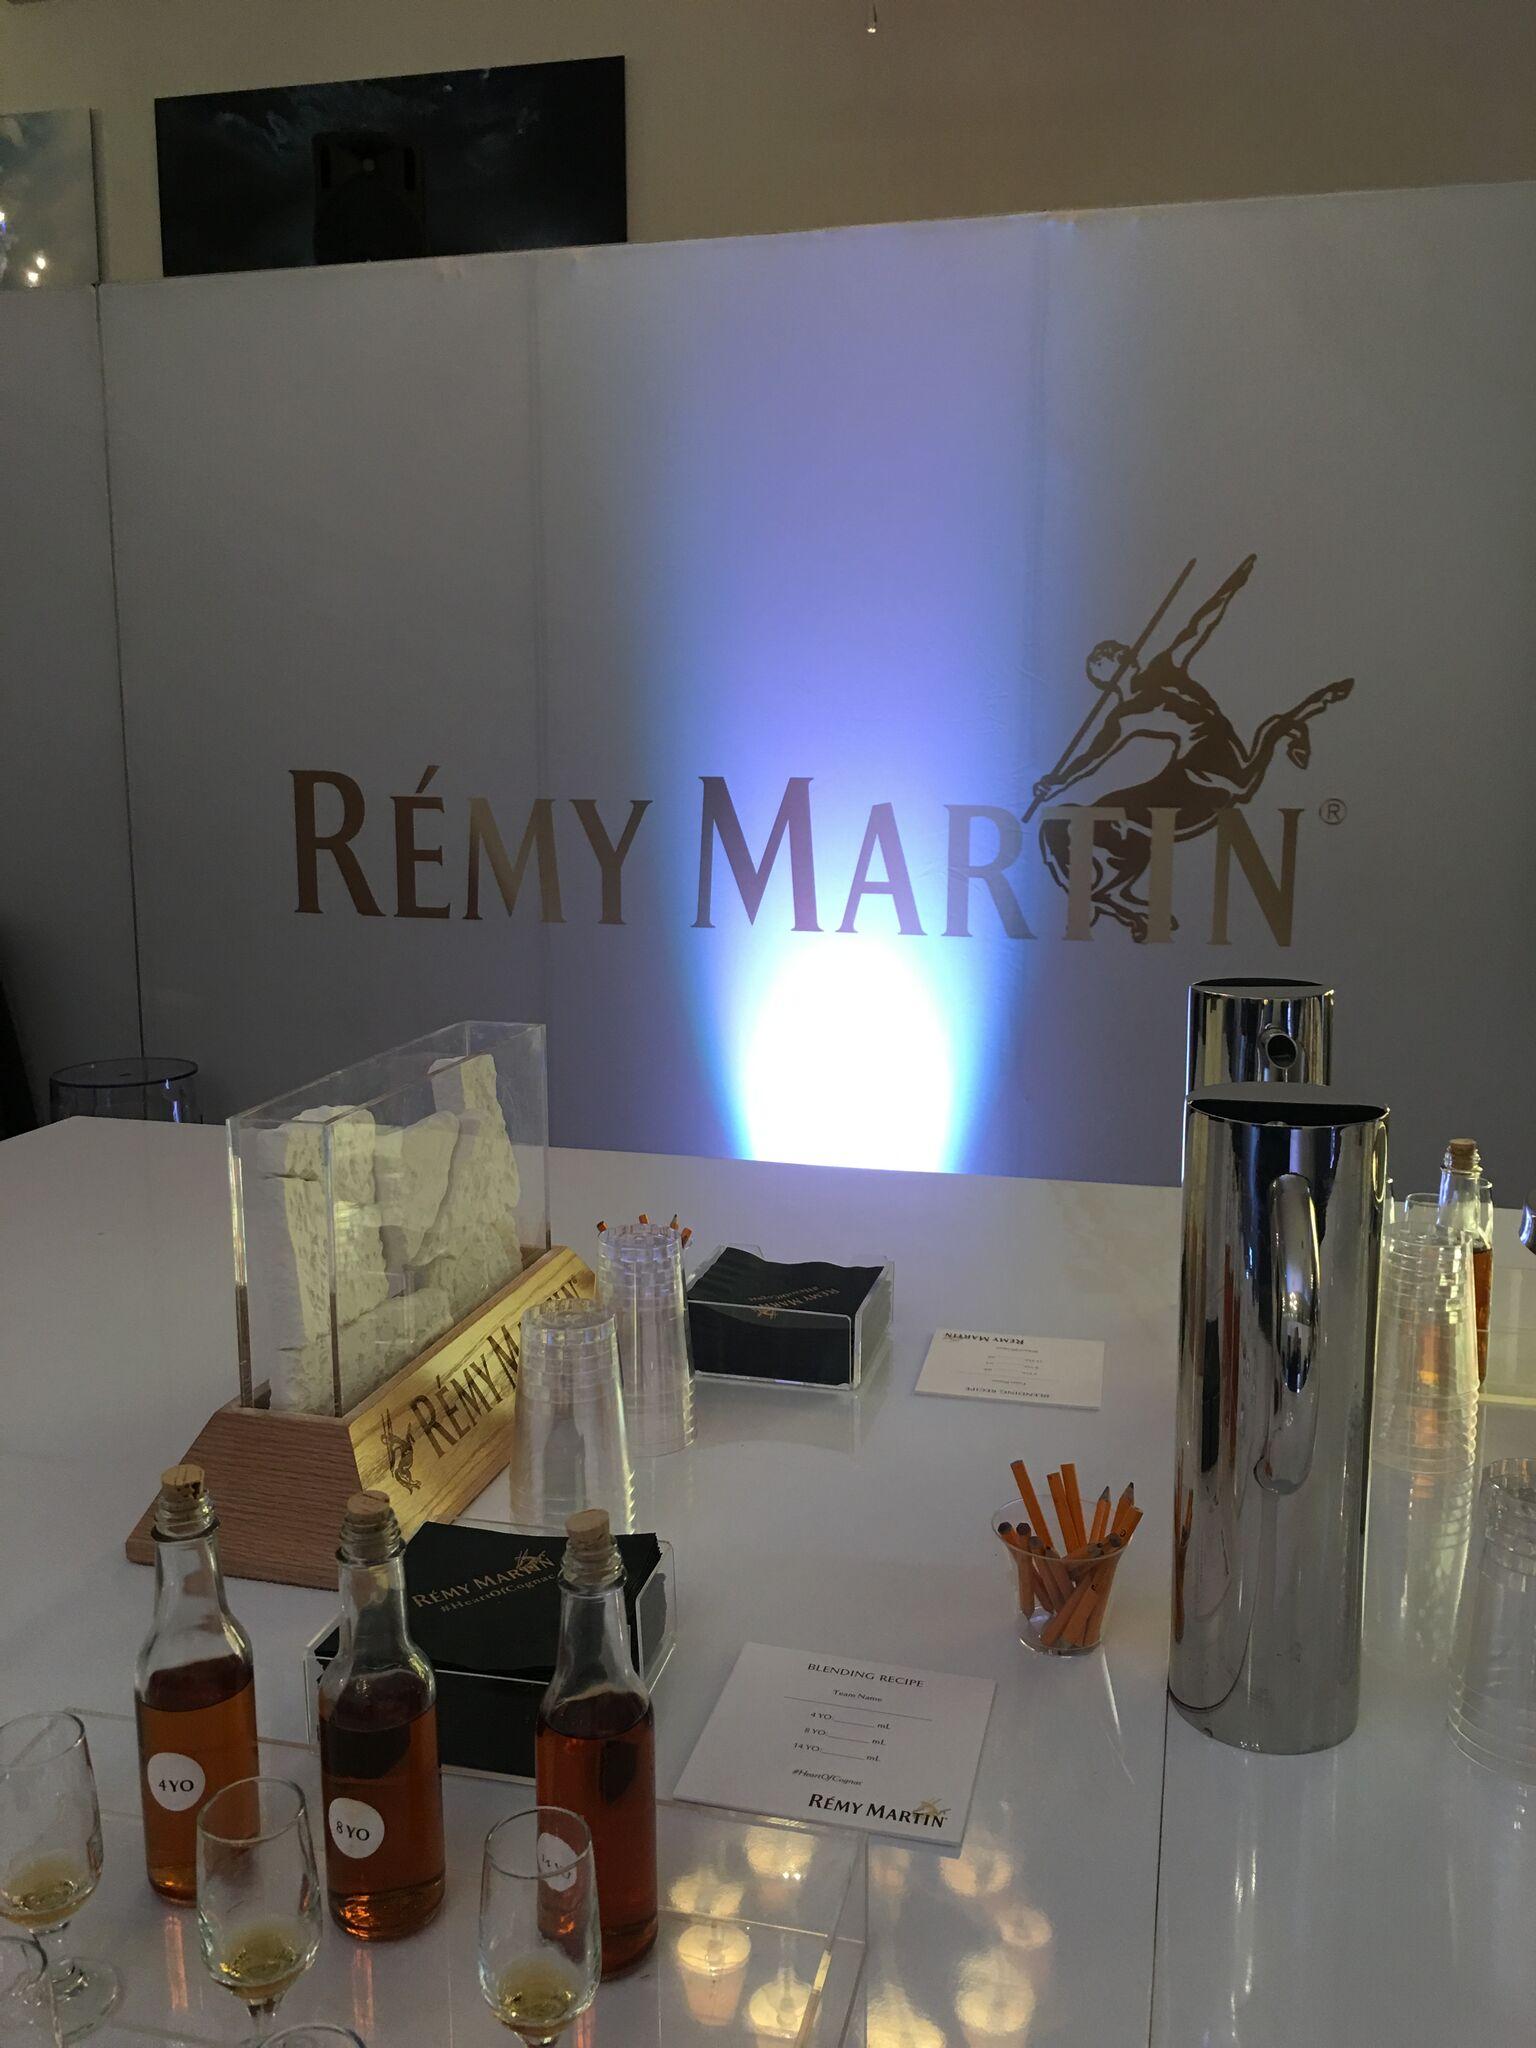 Remy Martin at Unici Casa